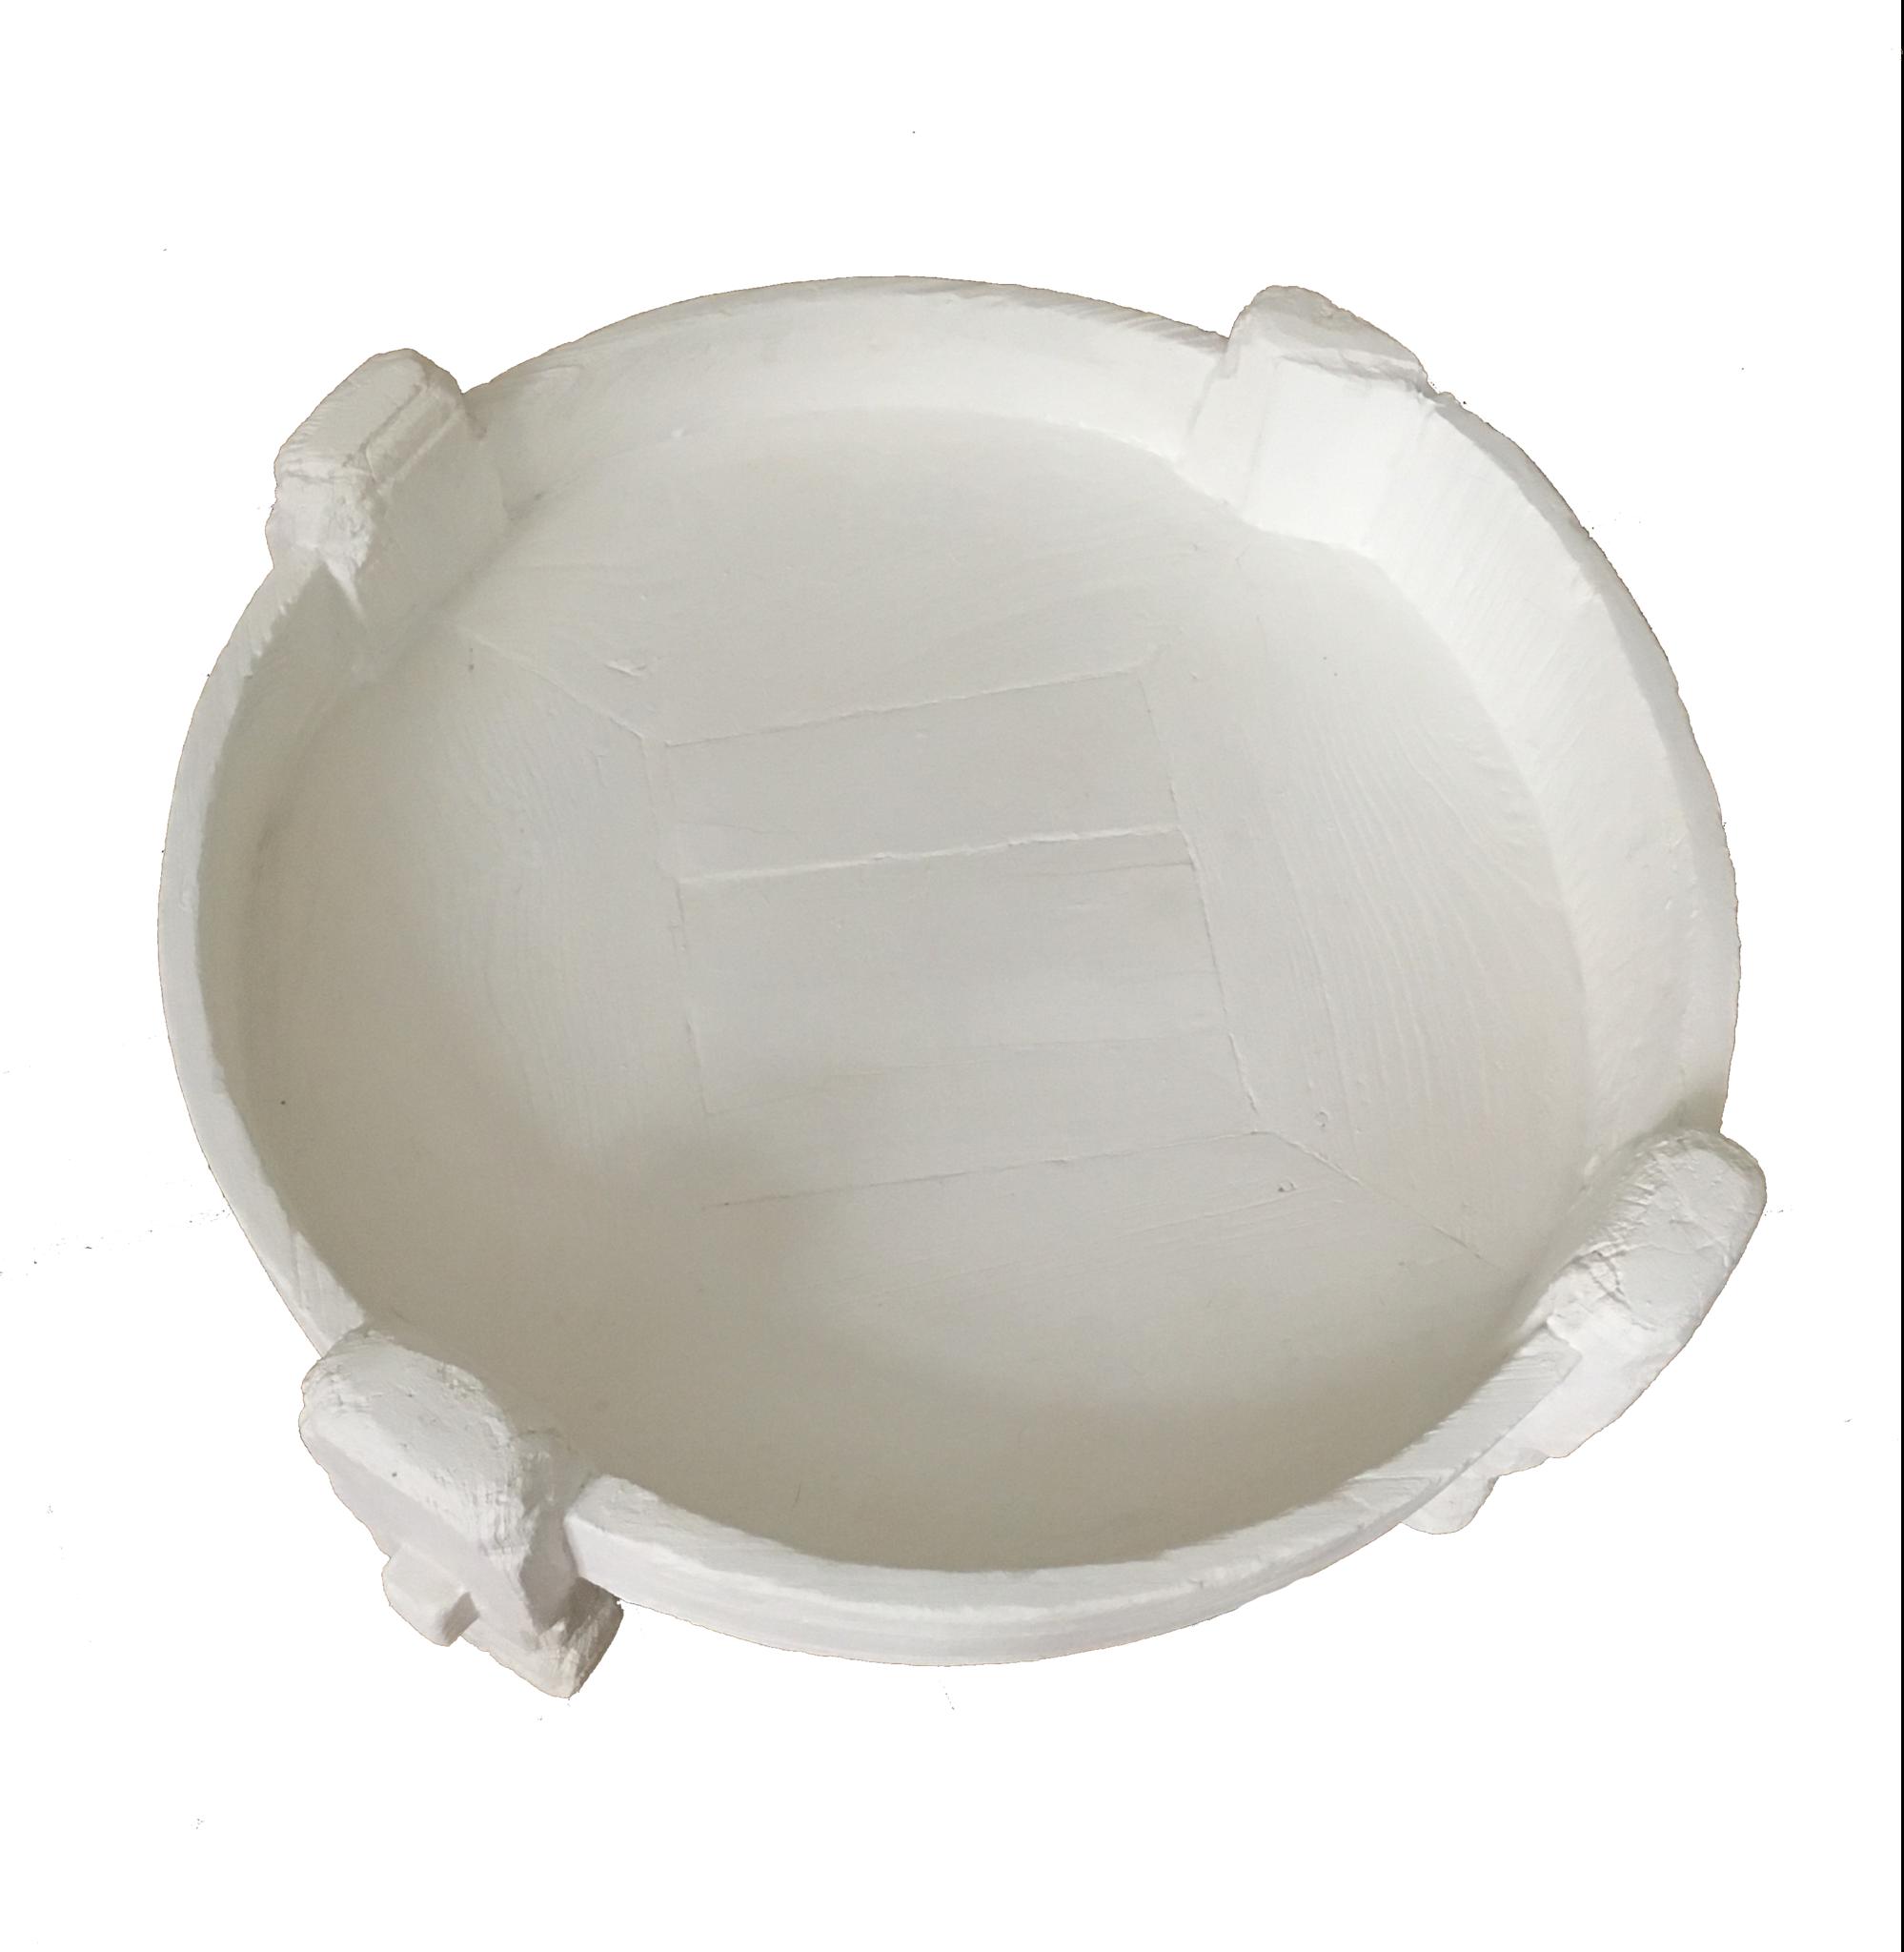 Petite Lily Interiors Indian coffee table grinder - white - Ø74xh37cm - Unique item